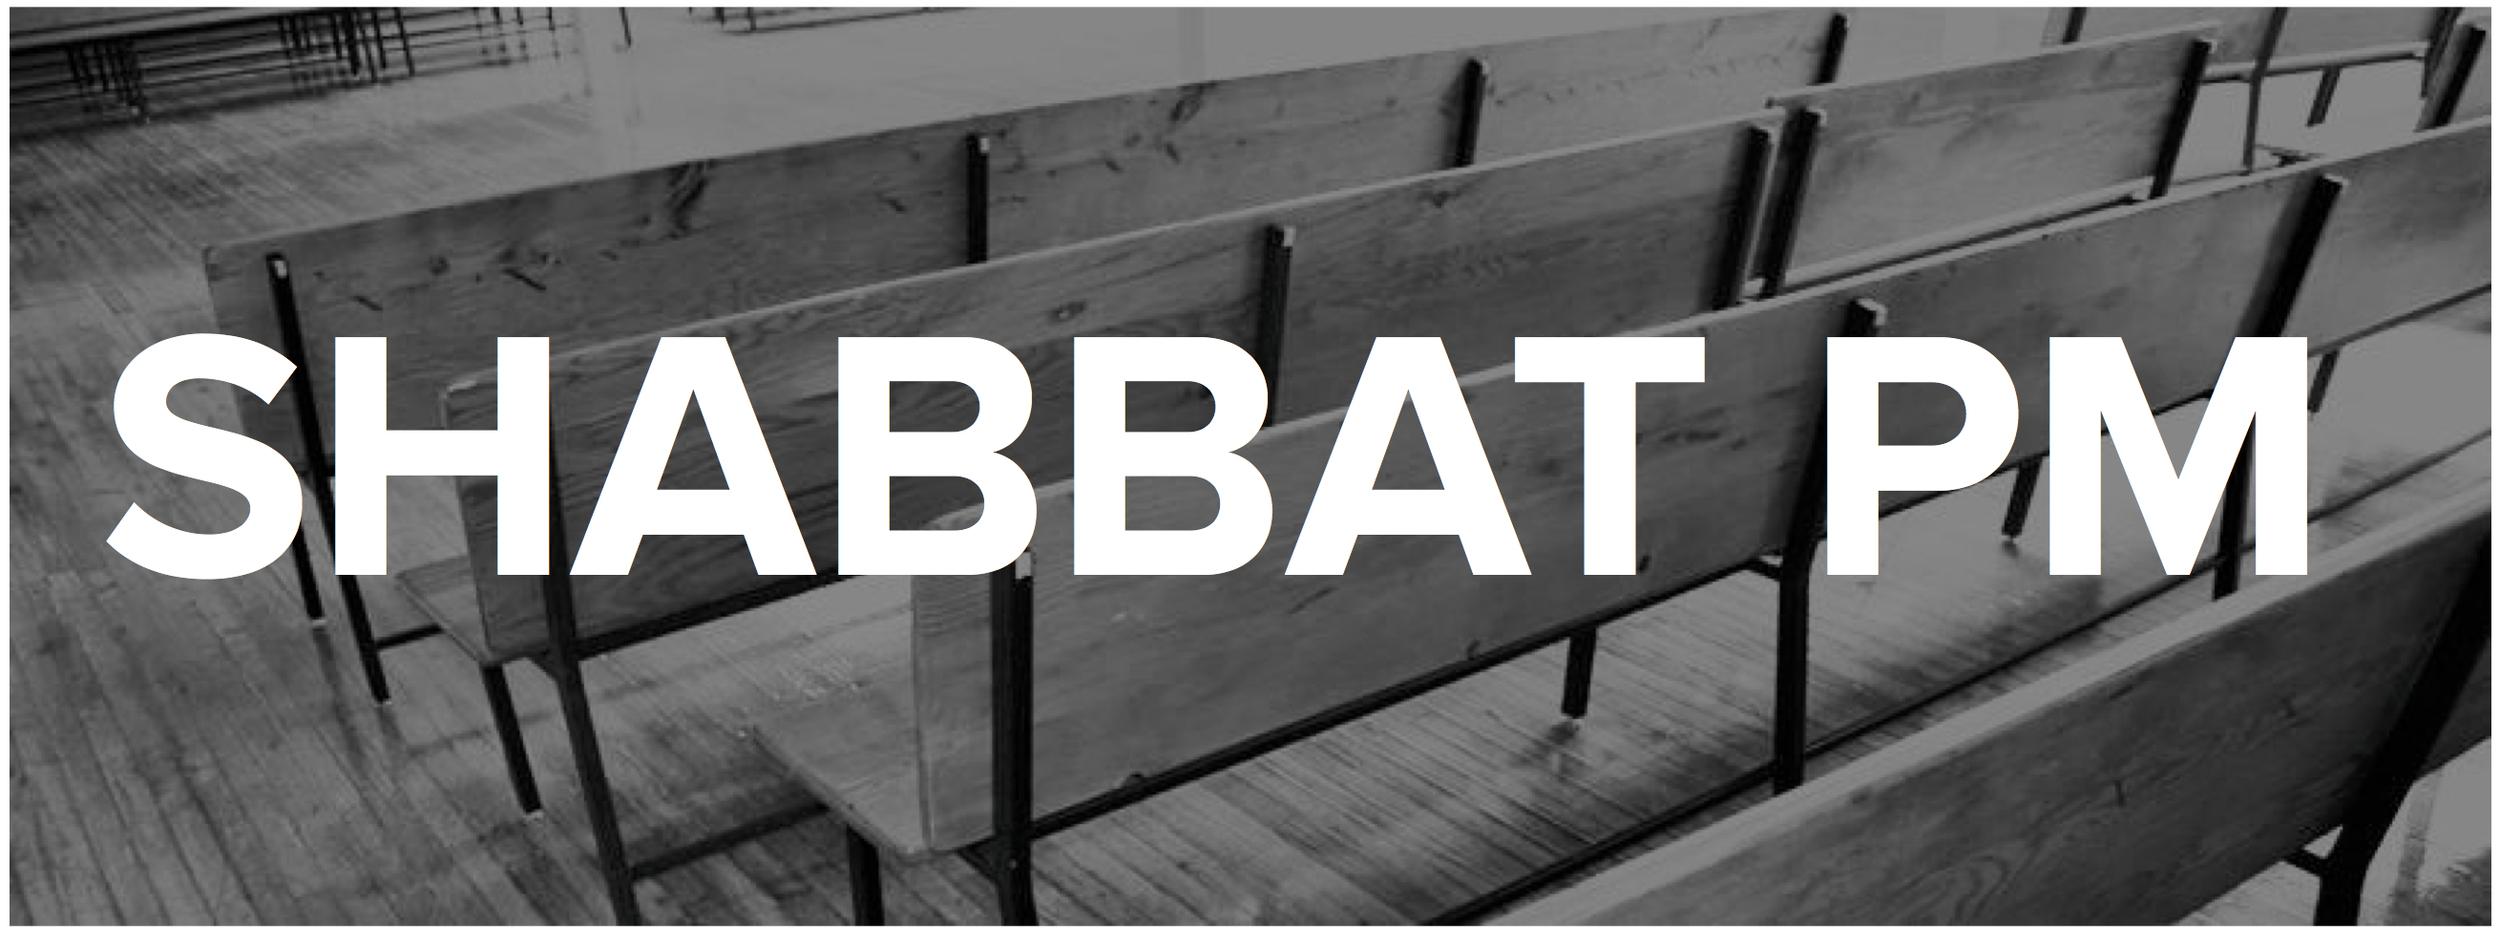 Shabbat PM.jpg